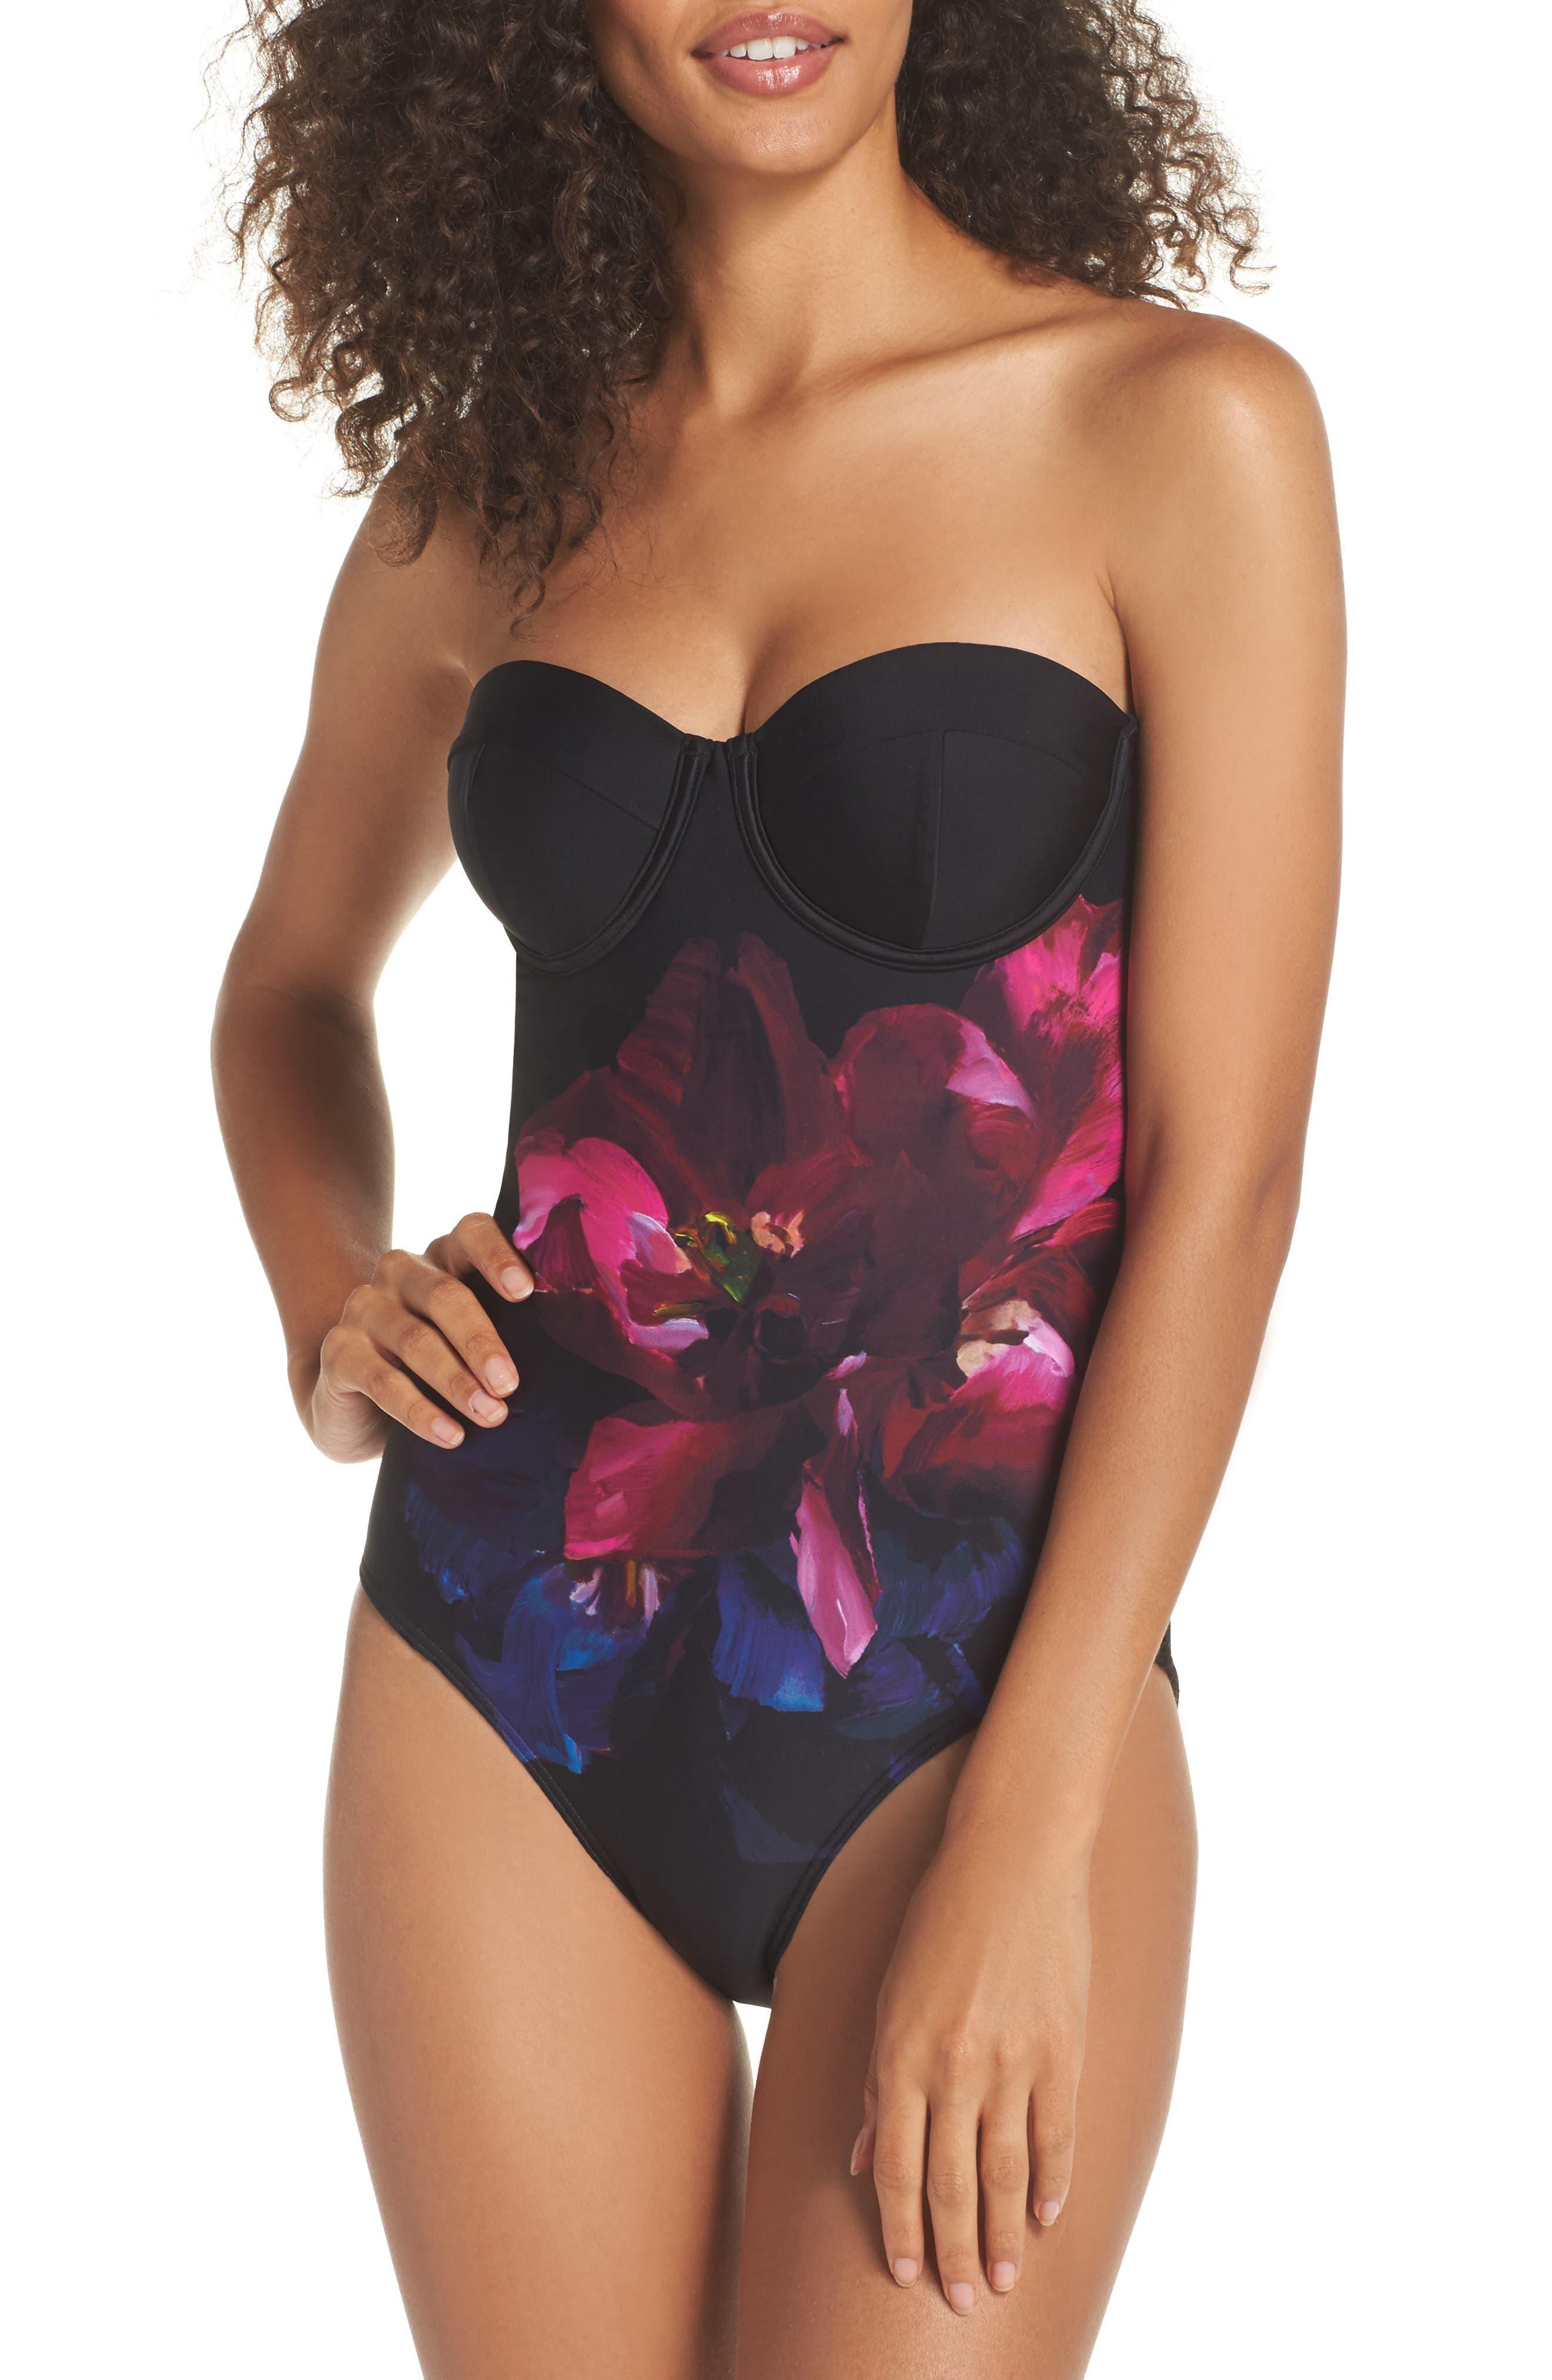 Imaja Impressionist Underwire One-Piece Swimsuit,                             Main thumbnail 1, color,                             001